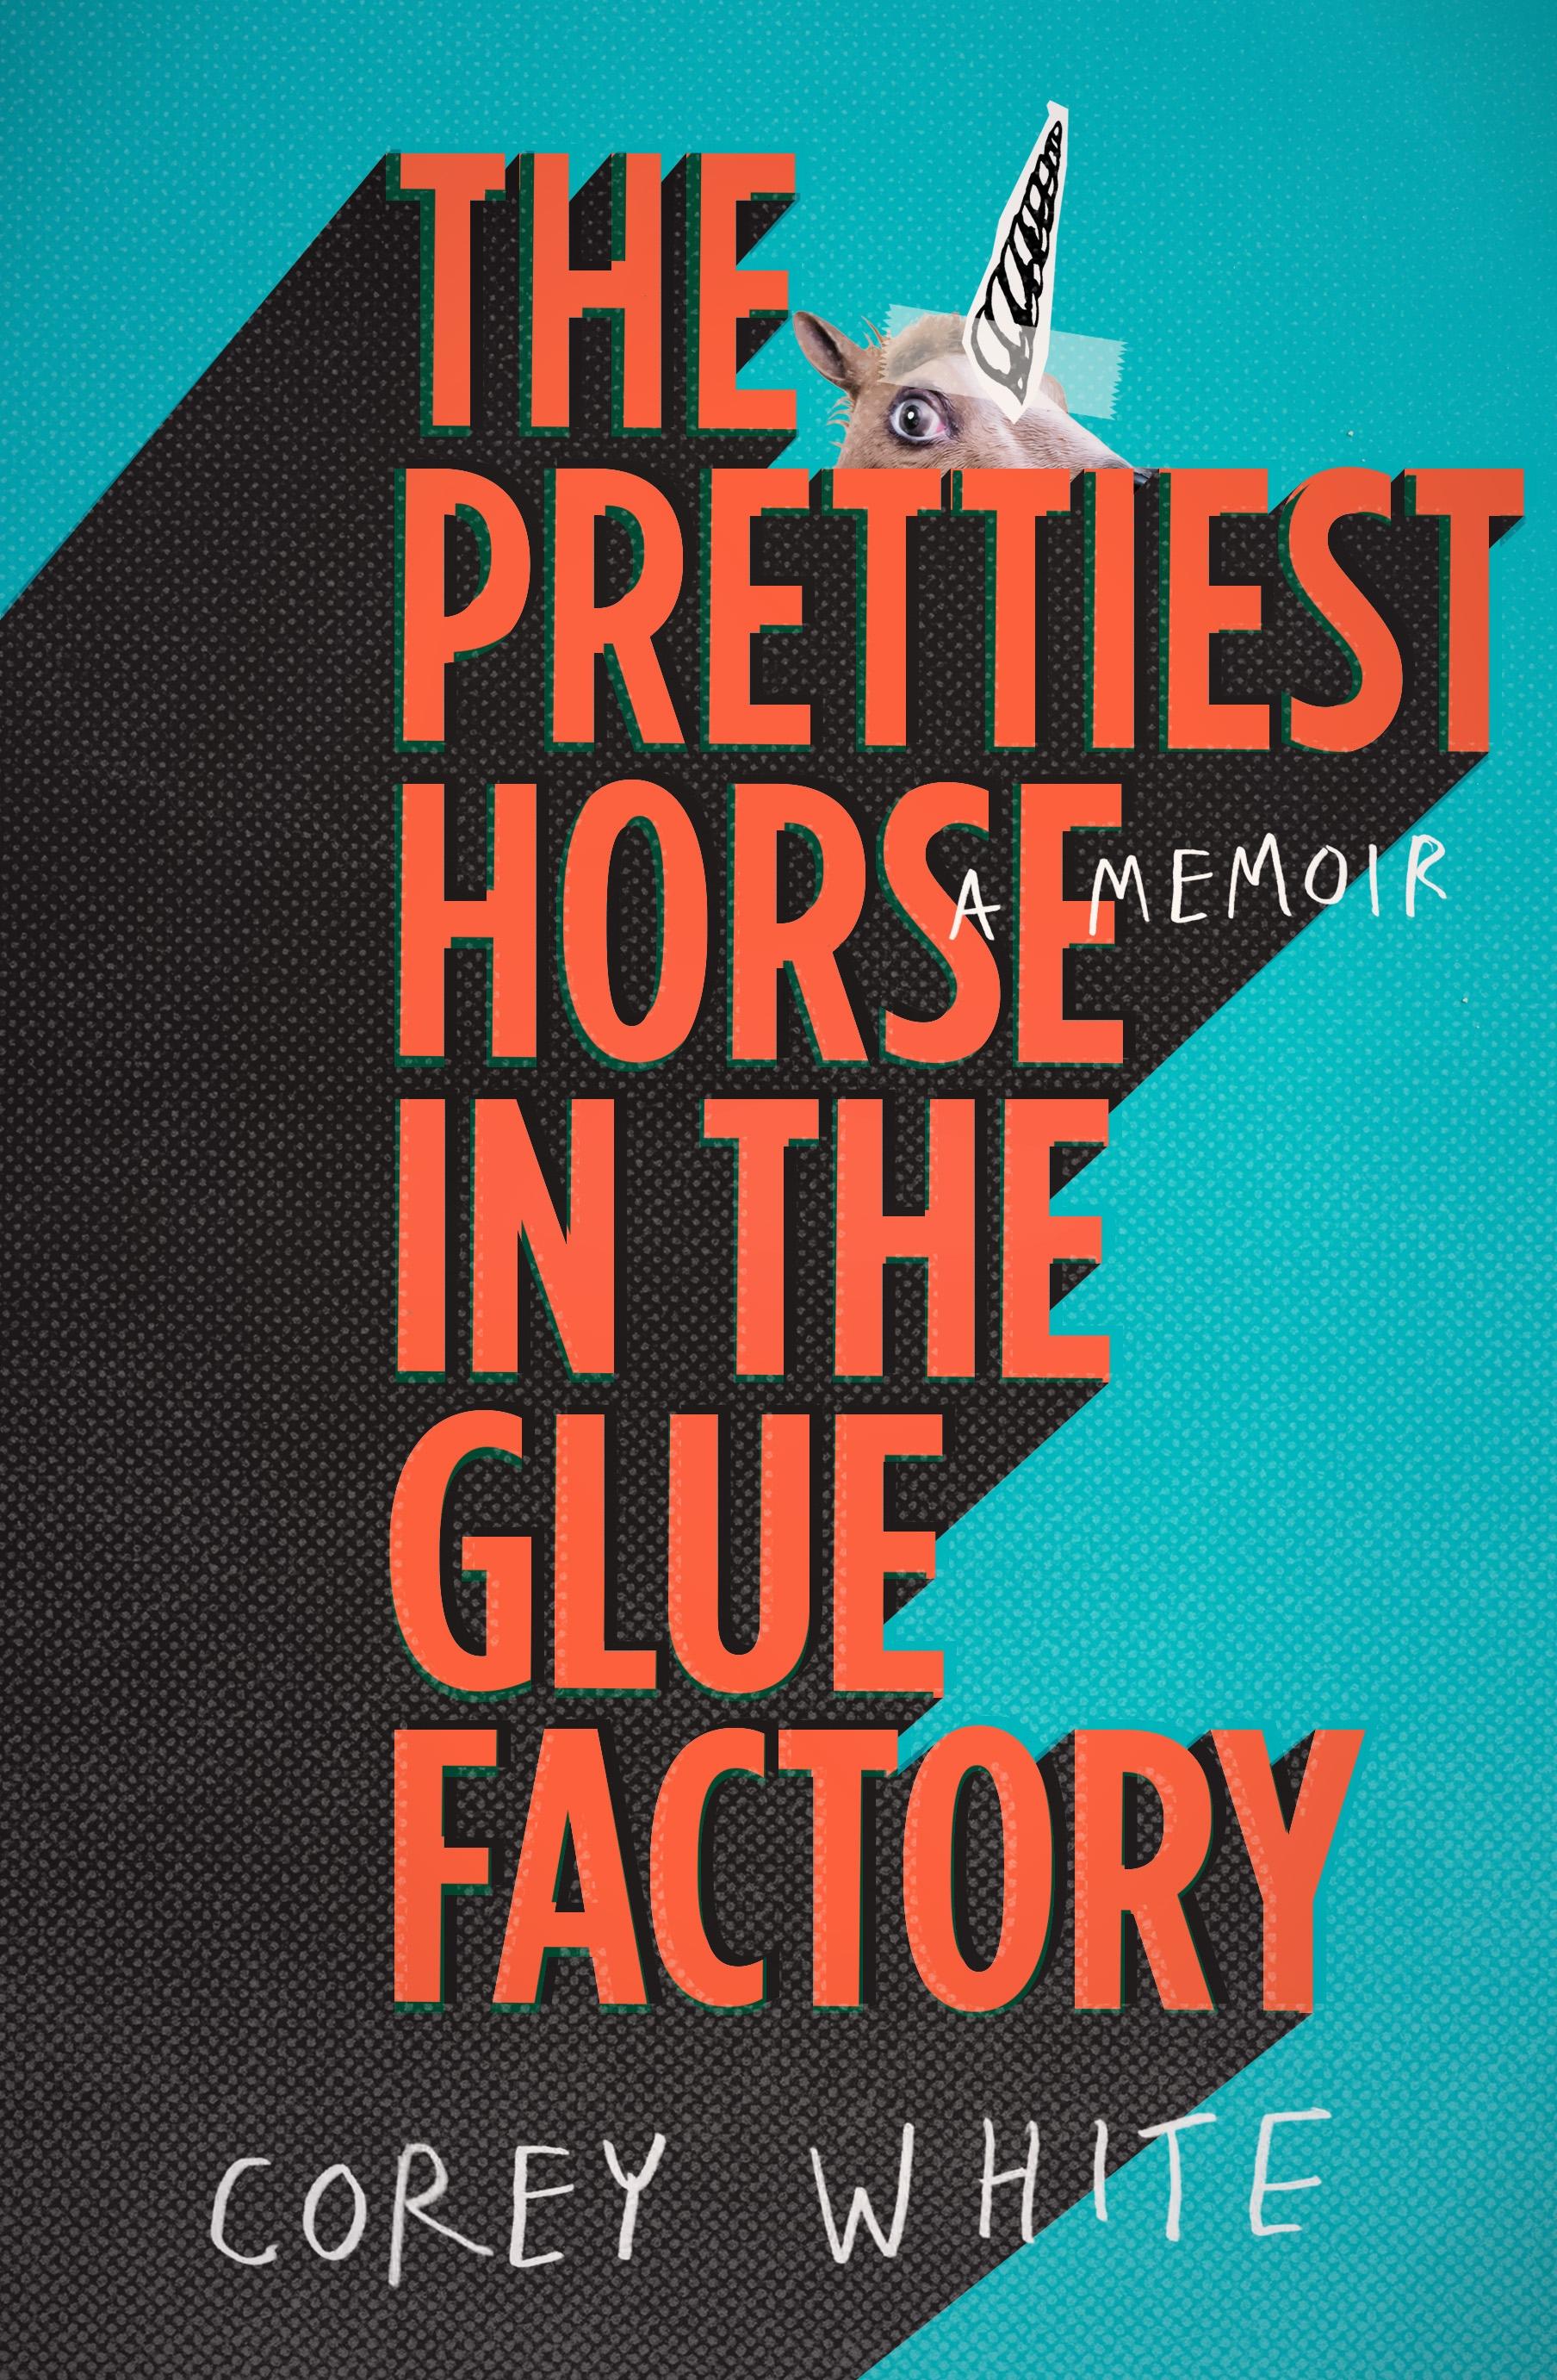 Prettiest Horse In The Glue Factory - Corey White.jpg